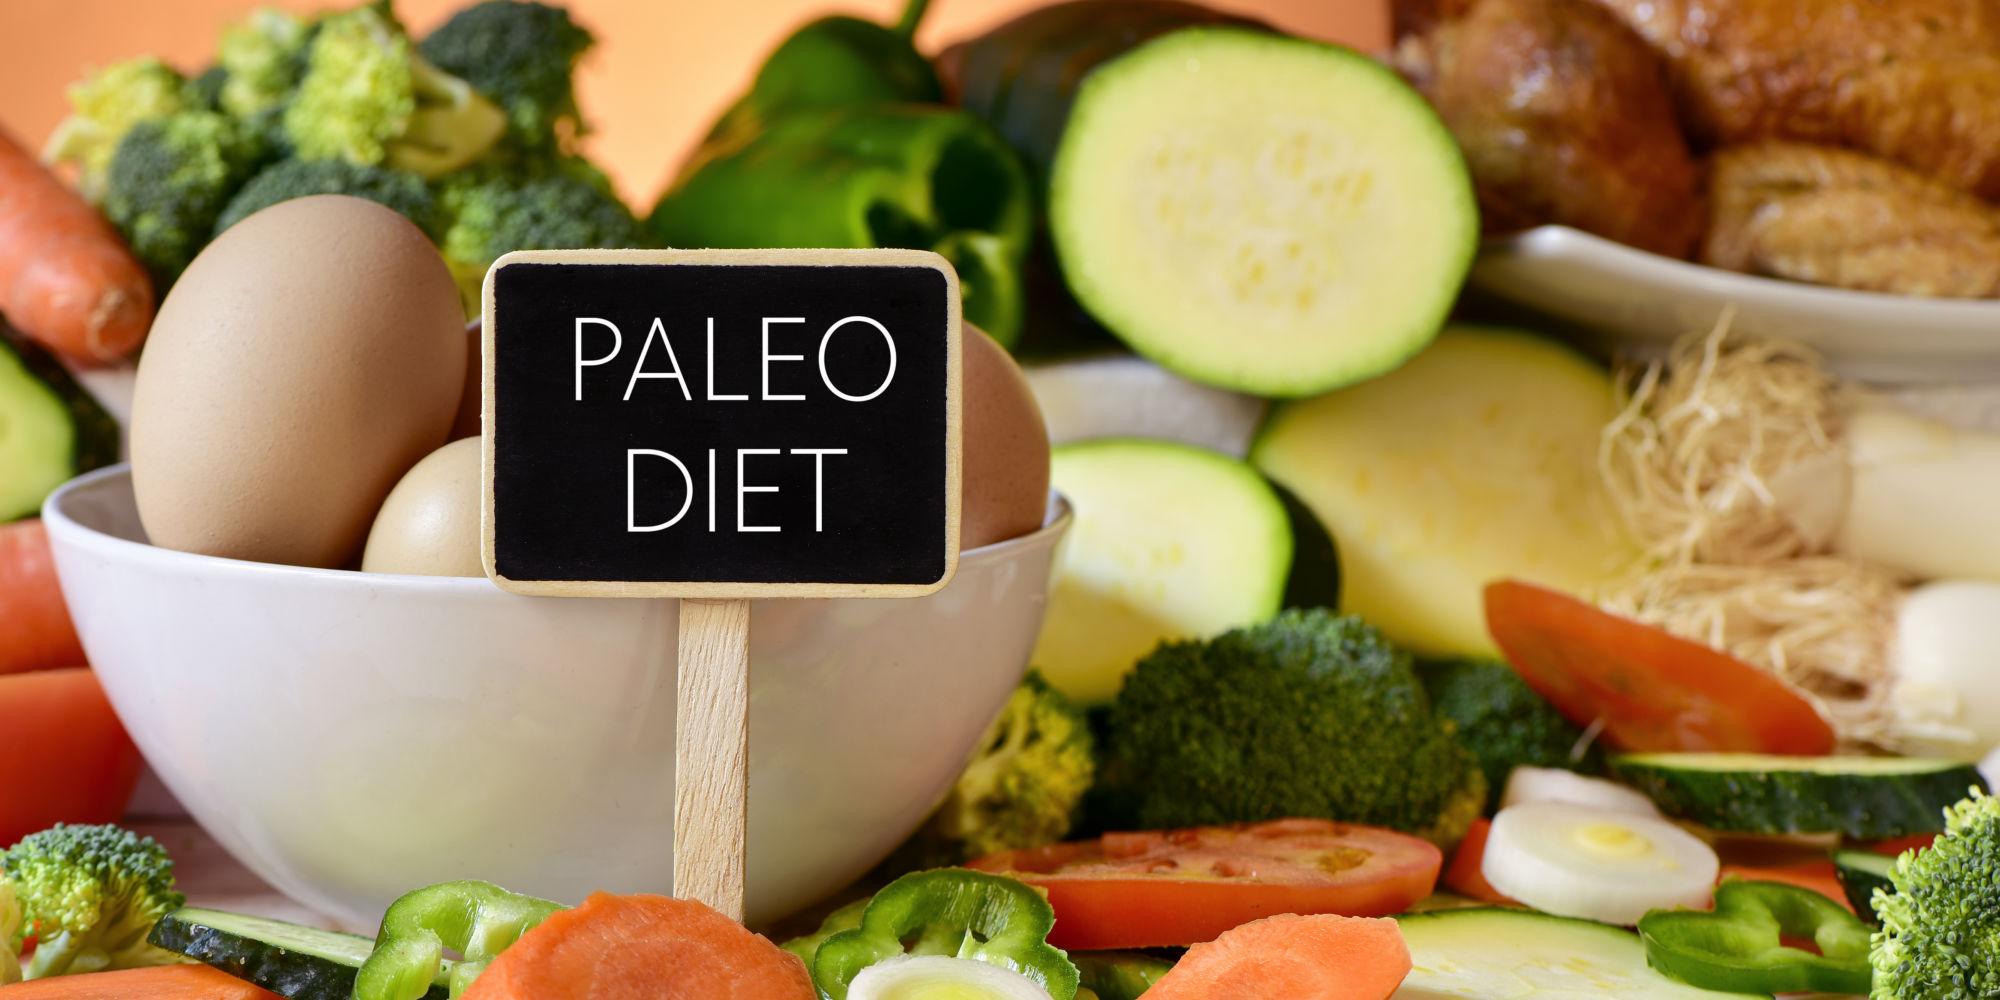 Diabetics should put paleo on pause, expert warns